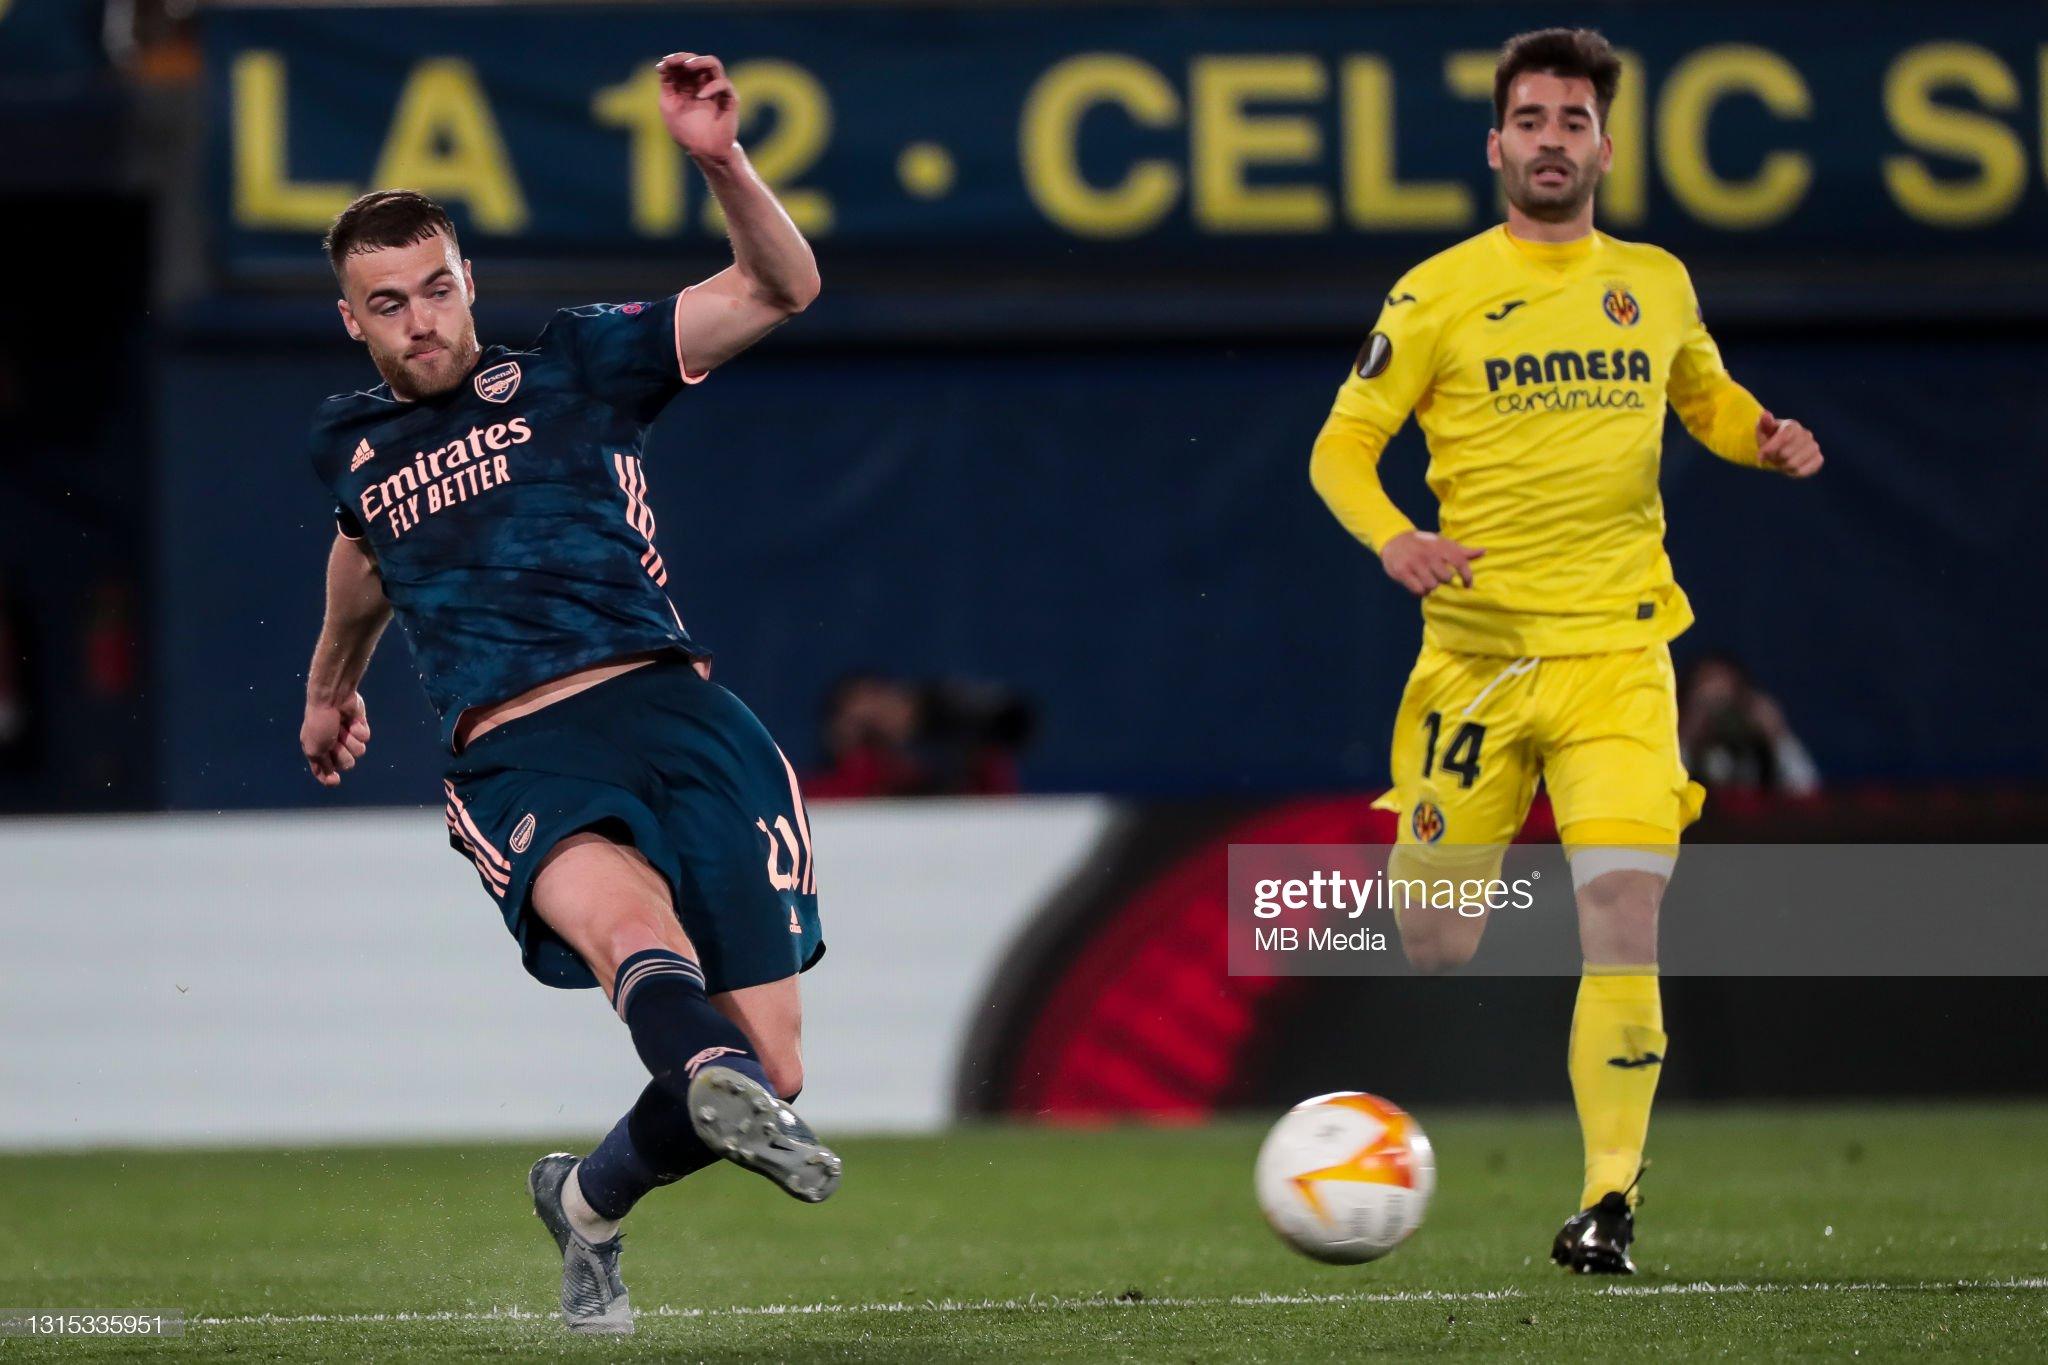 Arsenal vs Villarreal Preview, prediction and odds